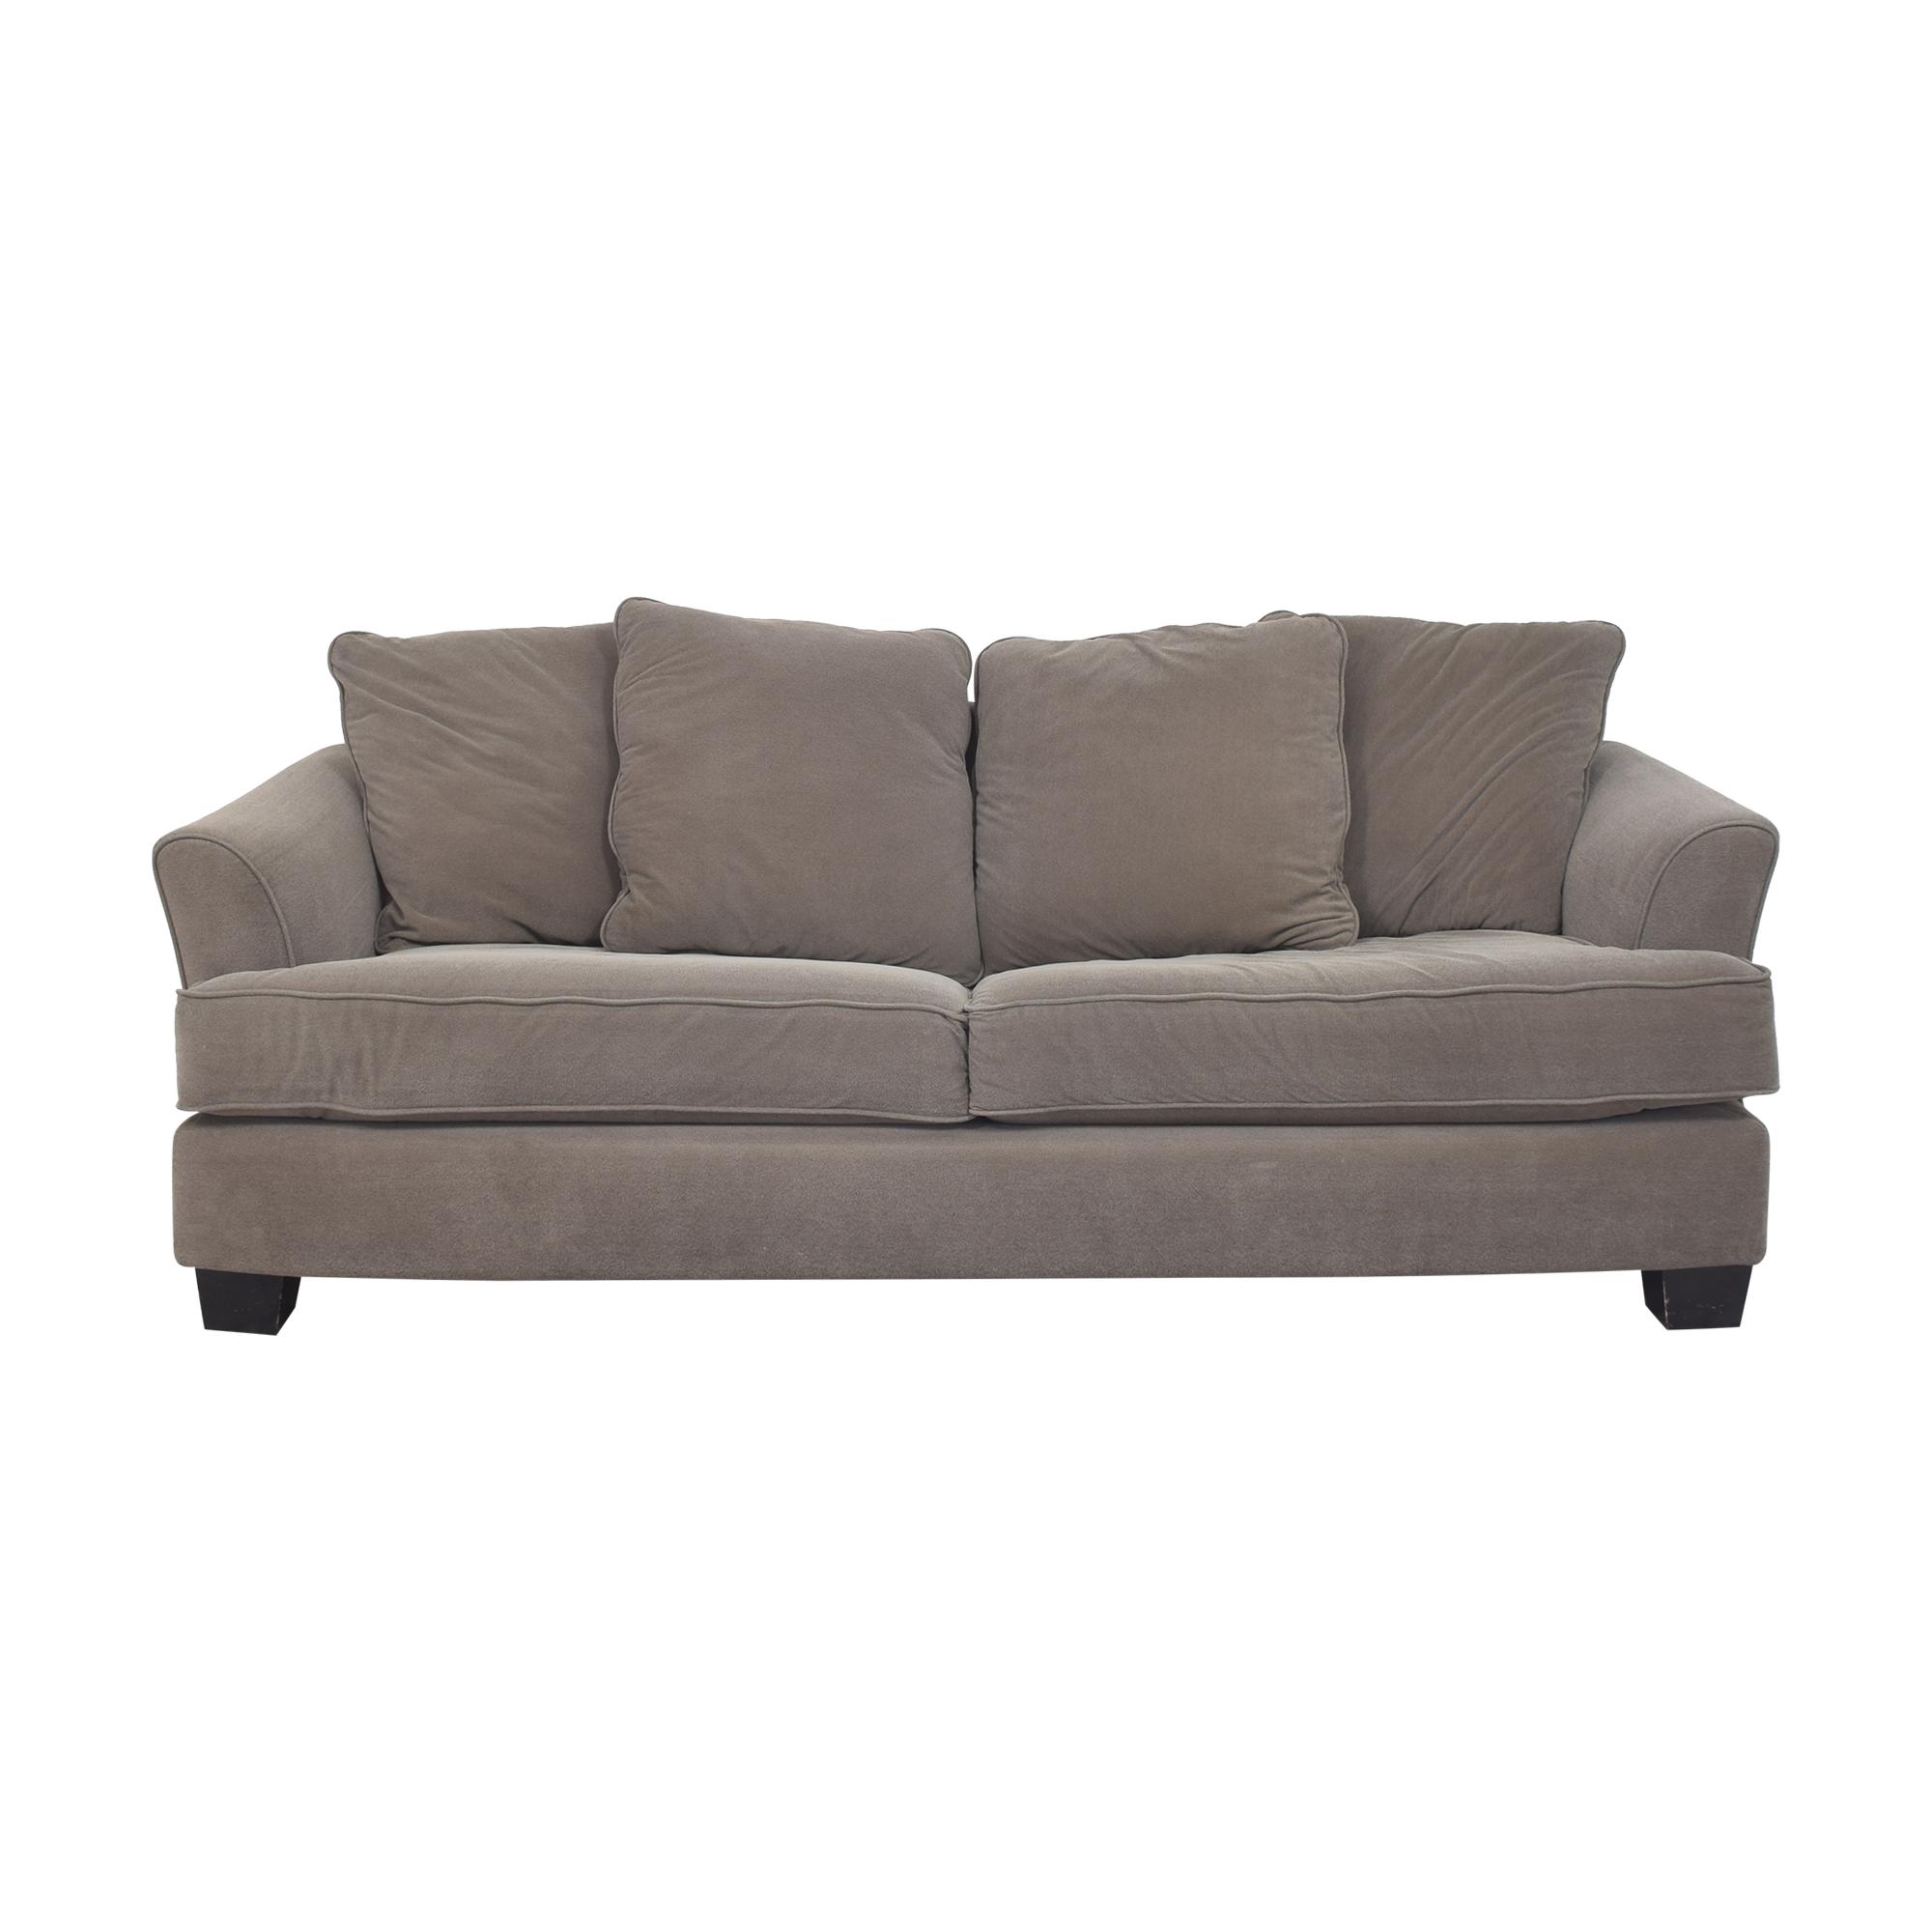 shop Raymour & Flanigan Two Cushion Sleeper Sofa Raymour & Flanigan